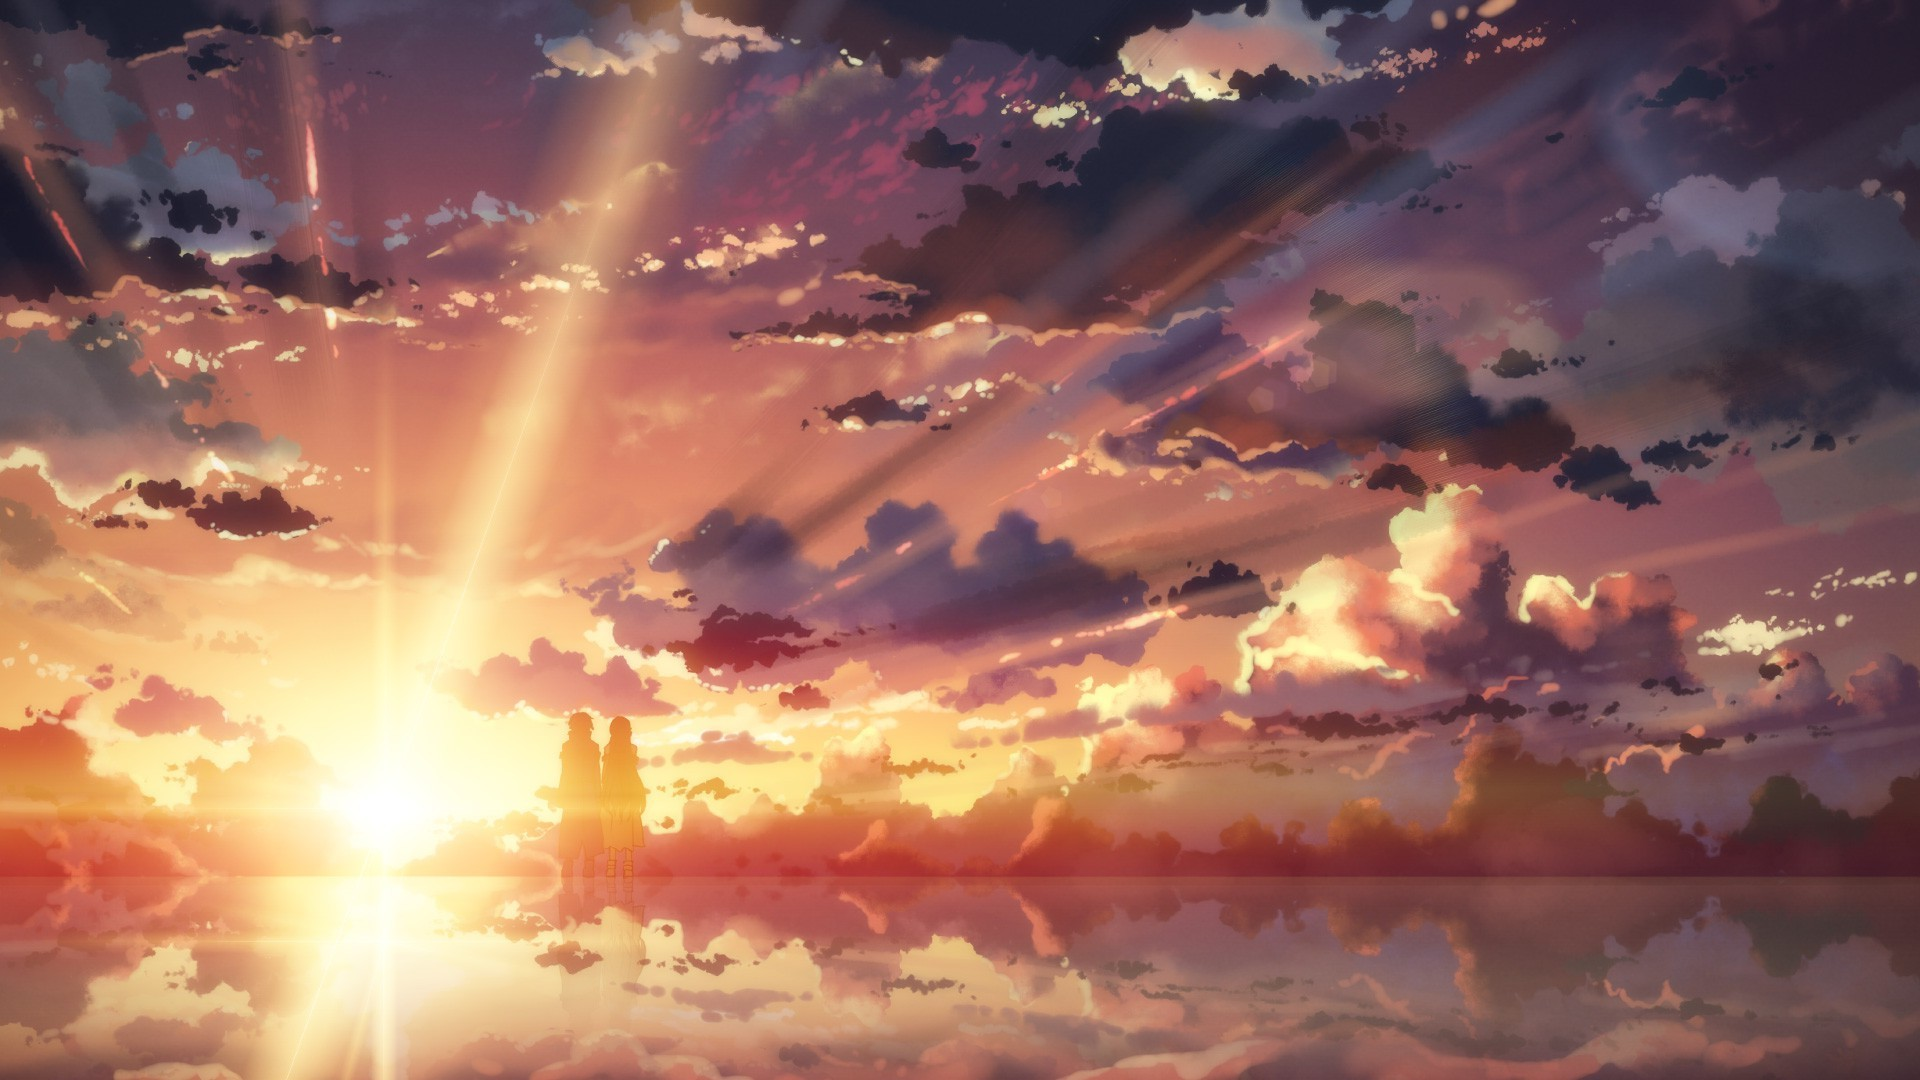 Sword Art line Wallpaper Hd ✓ HD Wallpaper